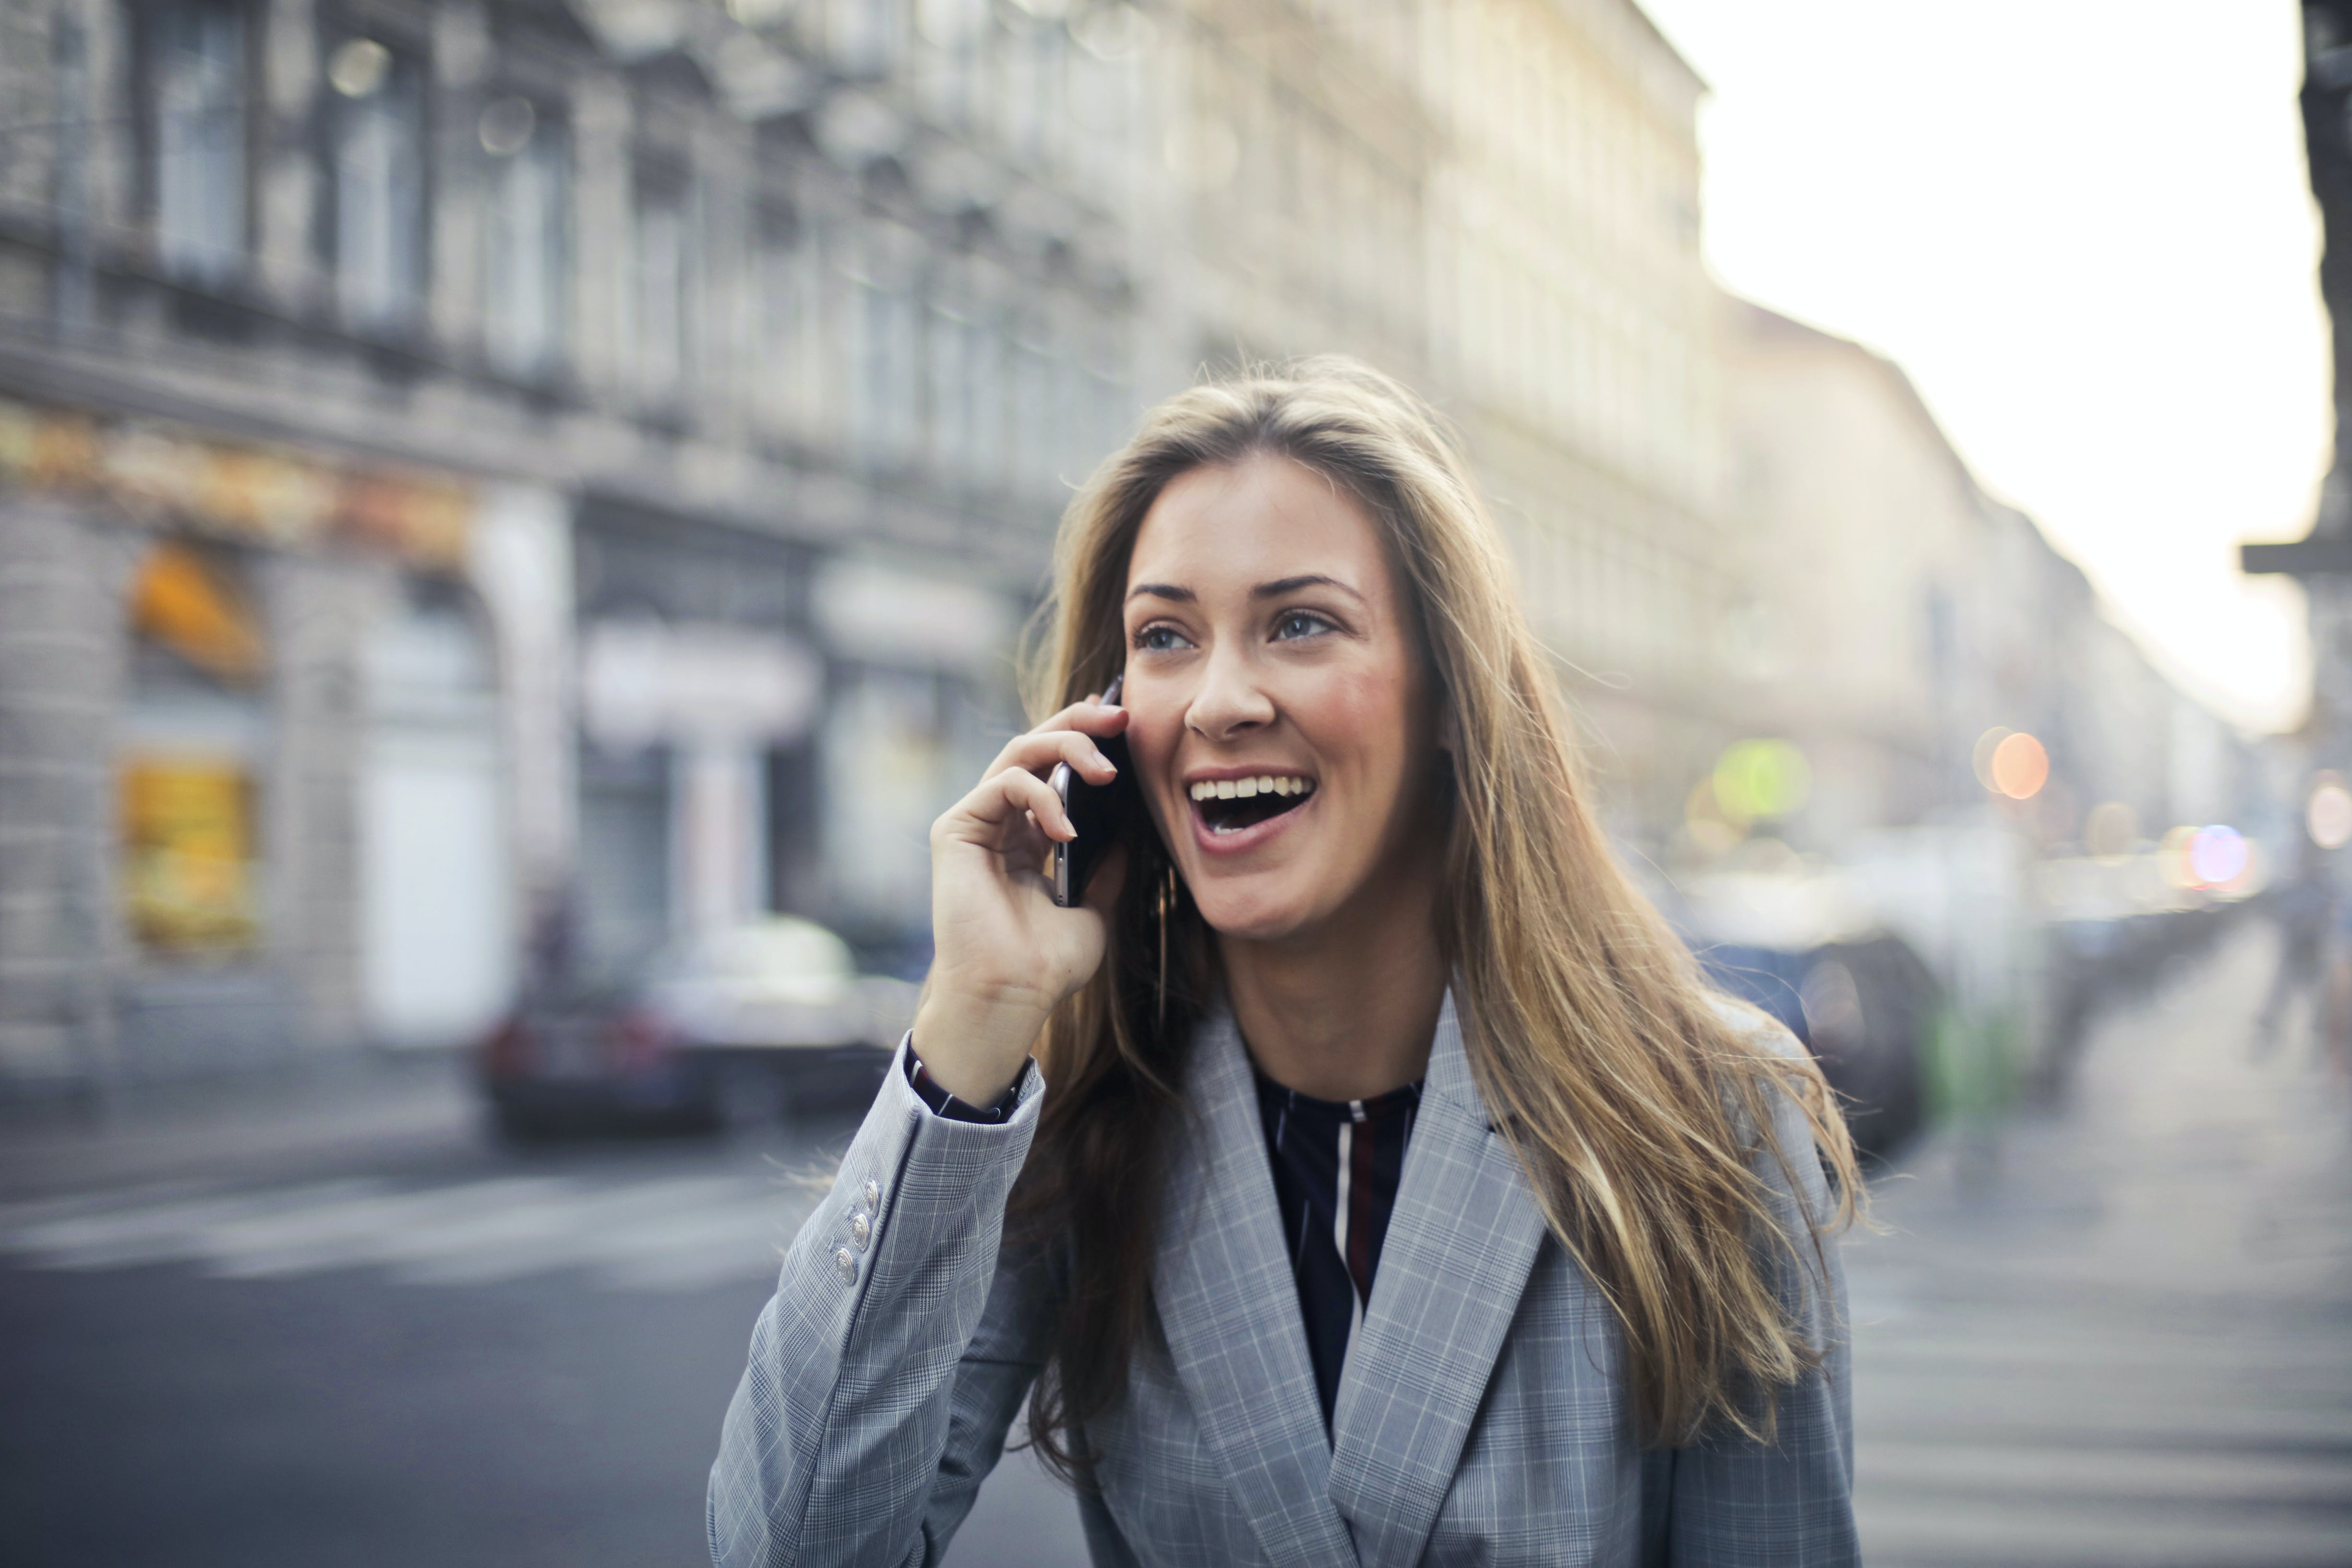 Blonde Hair Woman Wearing Gray Suit Jacket Holding Smartphone